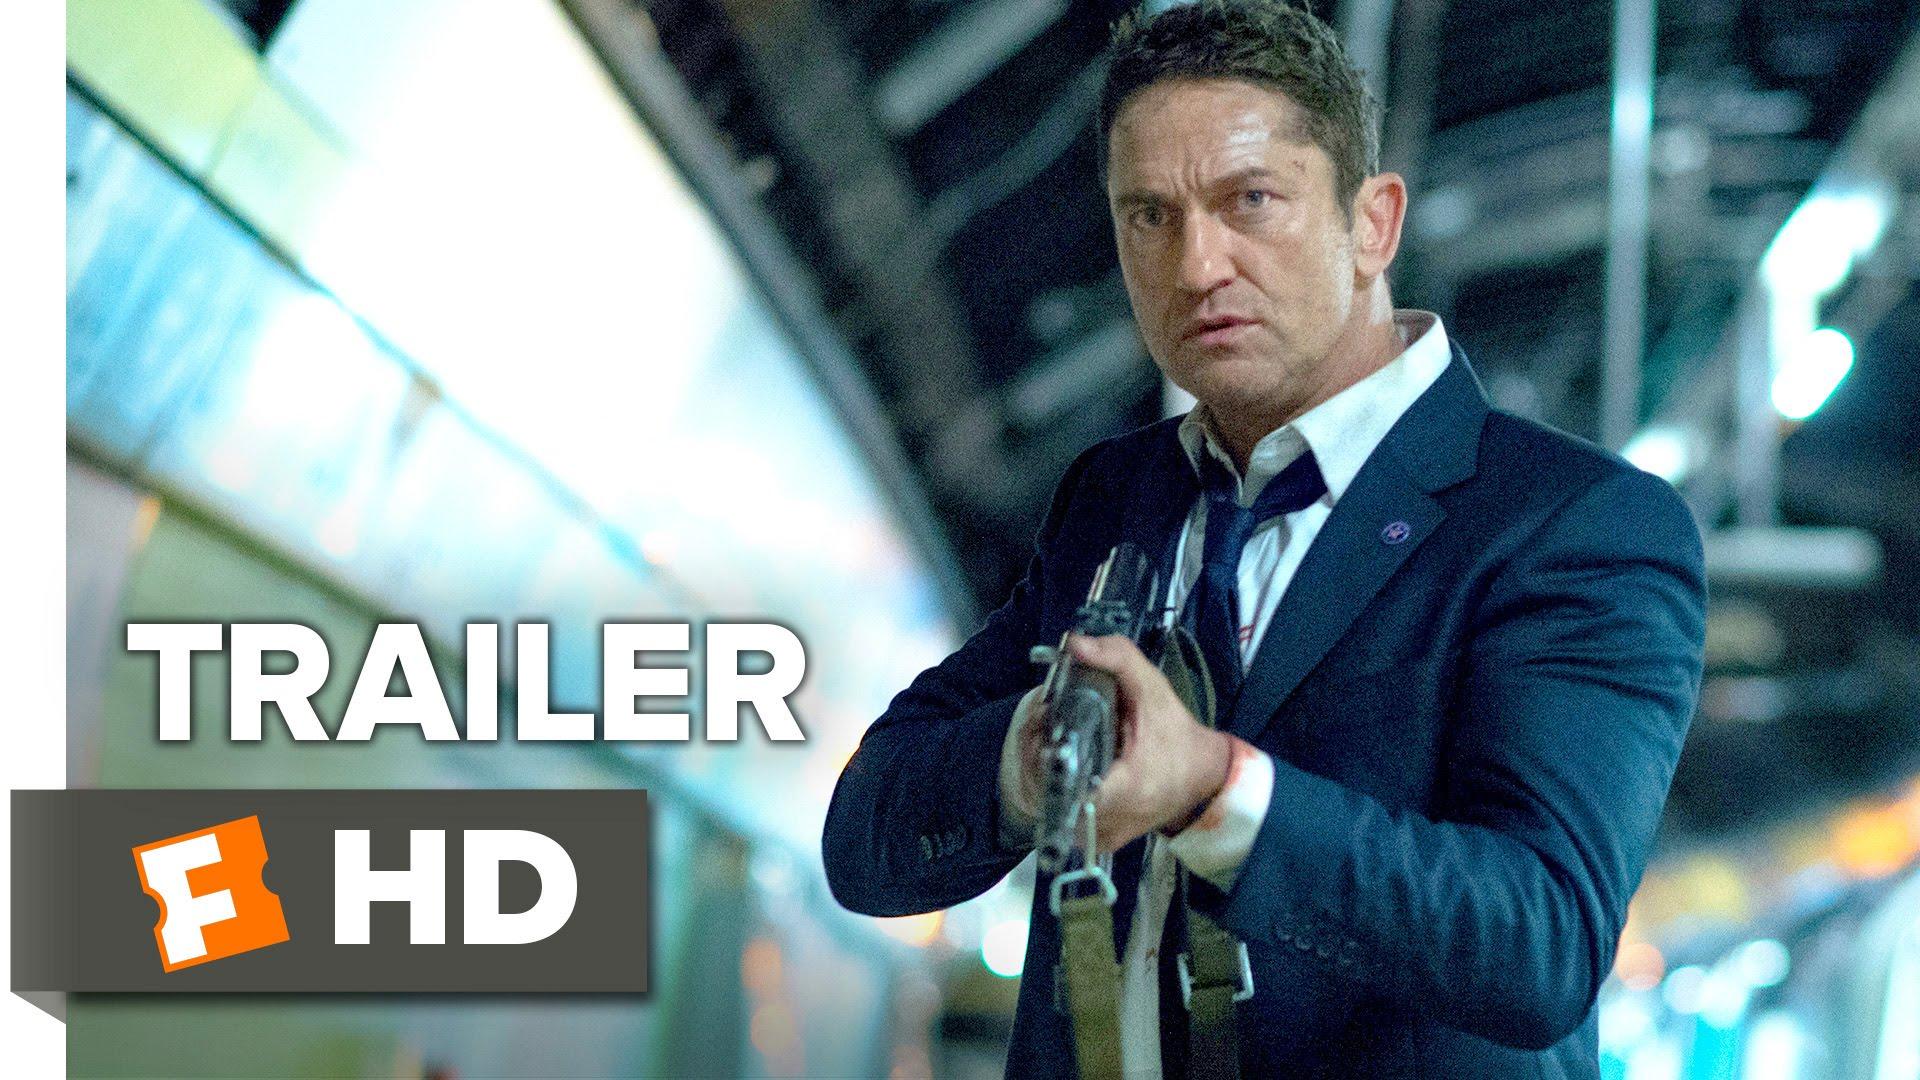 Image Result For Full Movie London Has Fallen